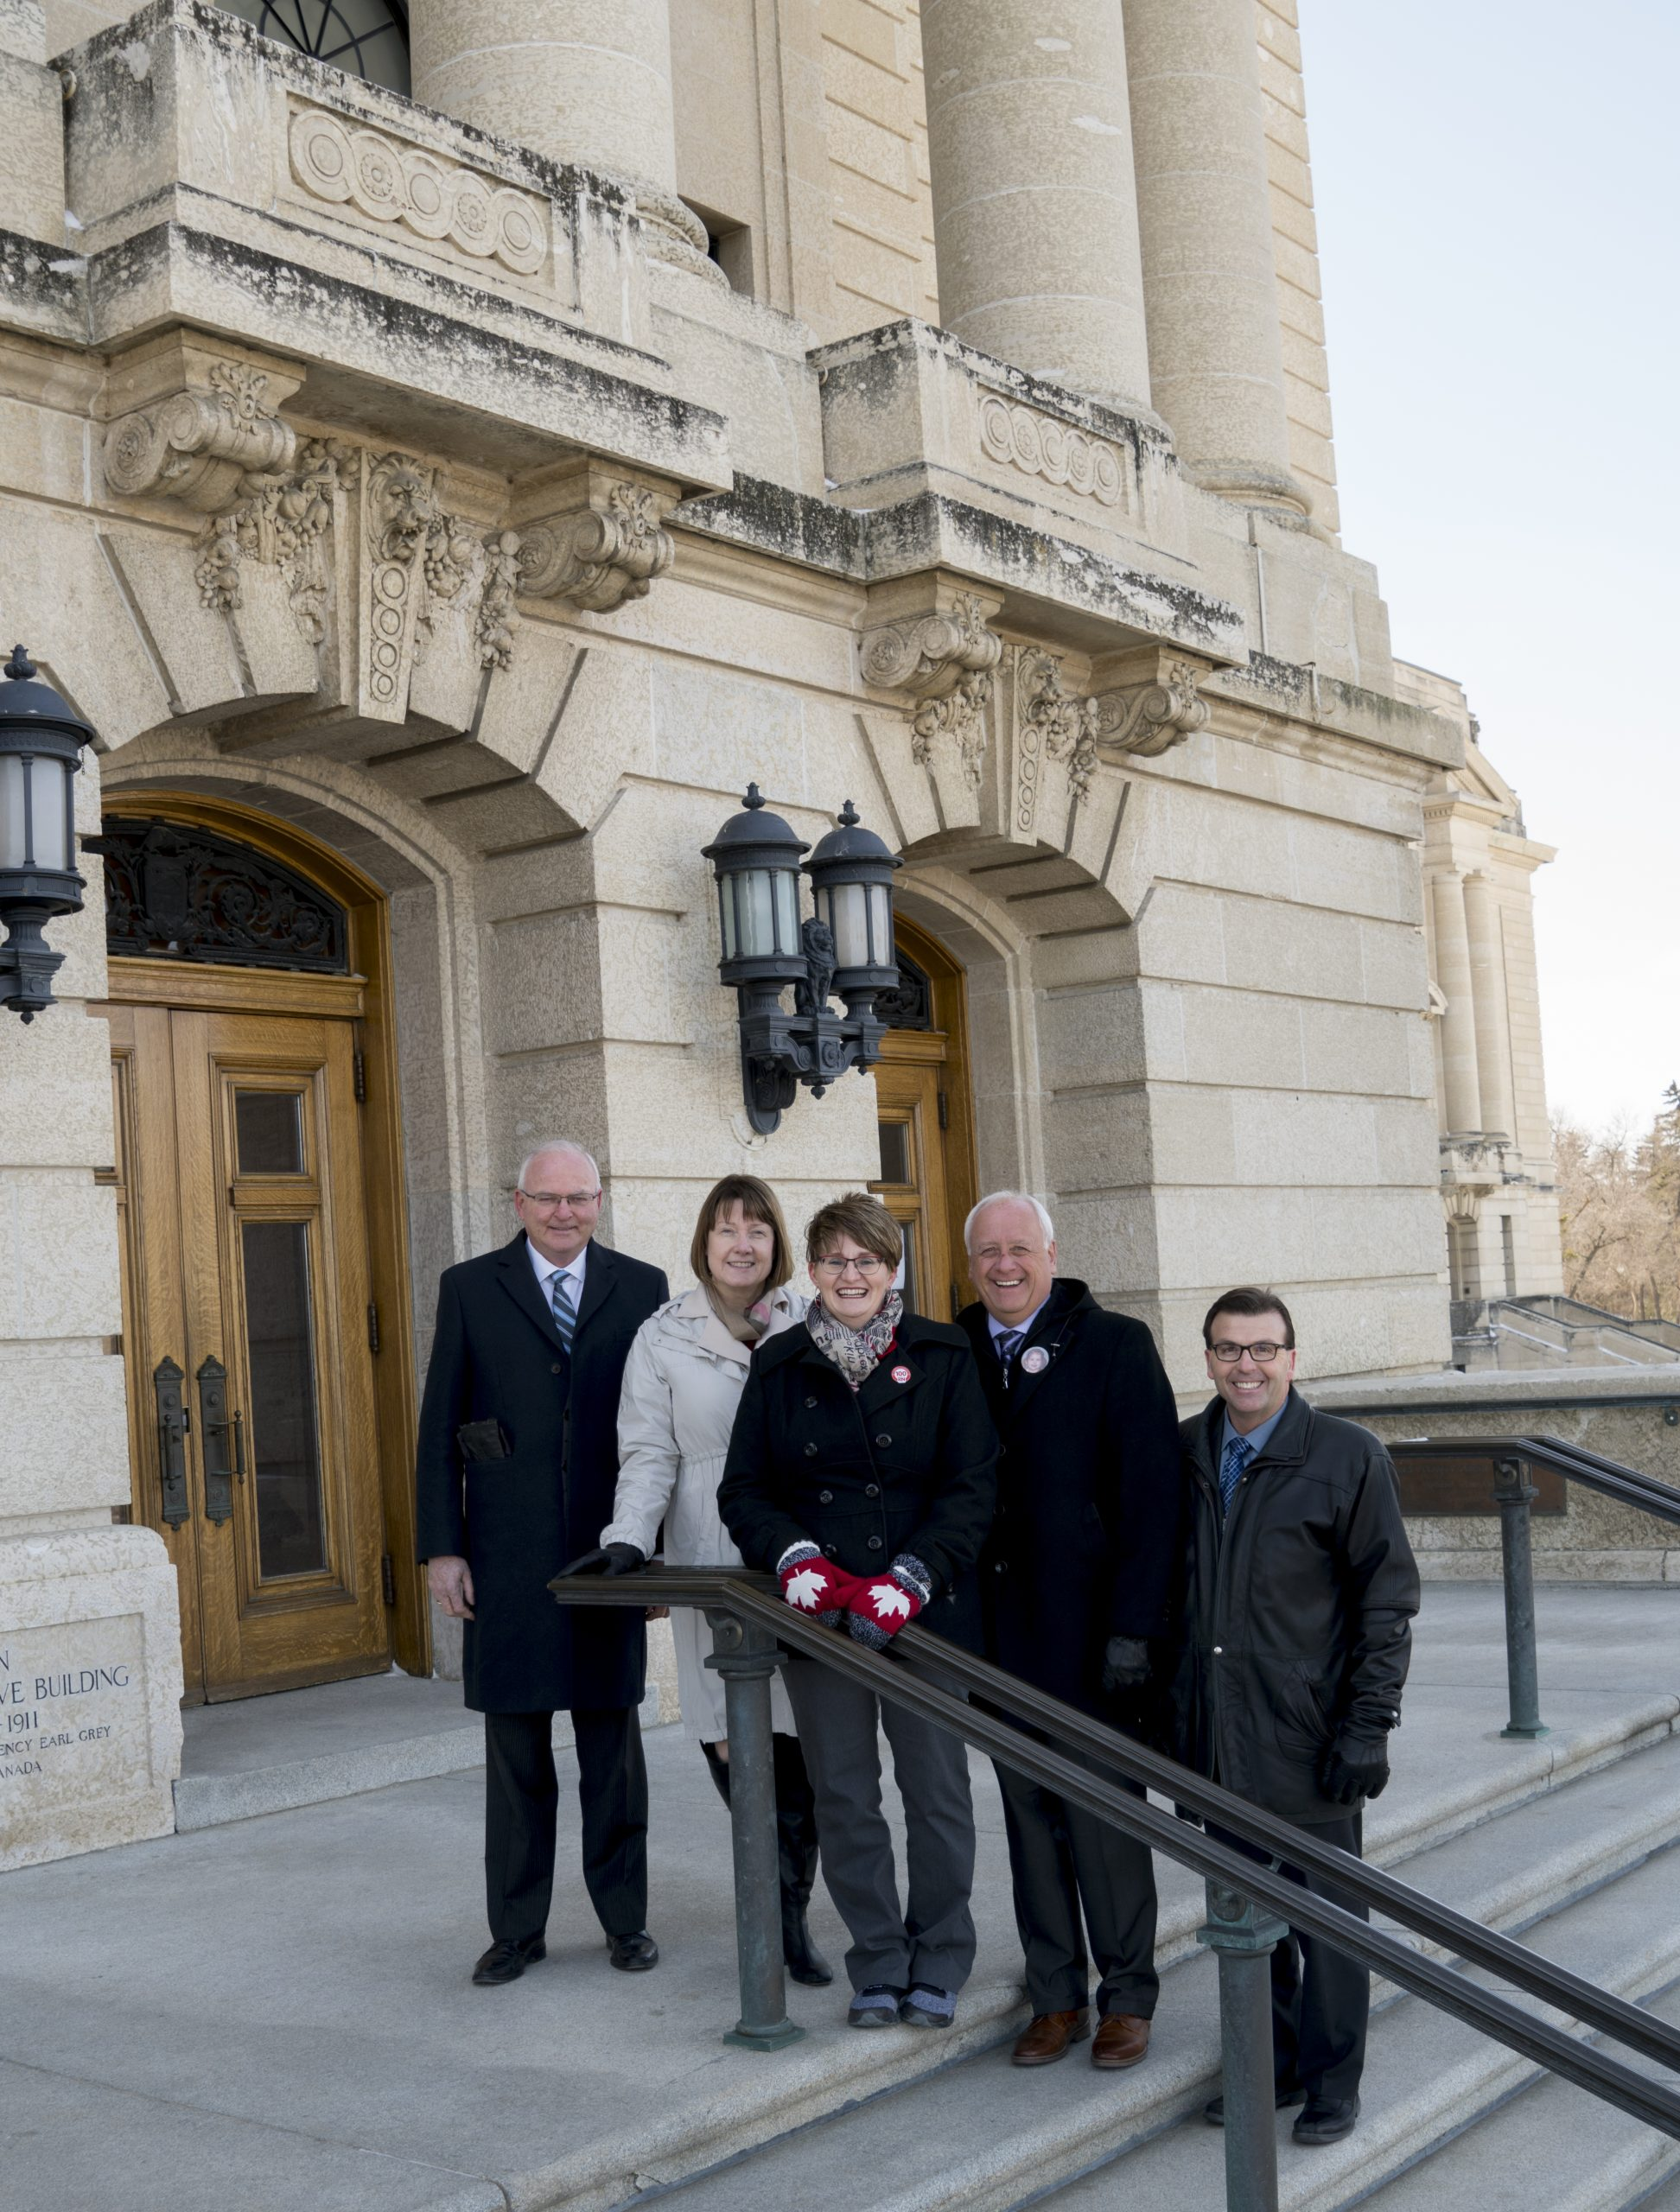 SRNA, 100 years, legislature